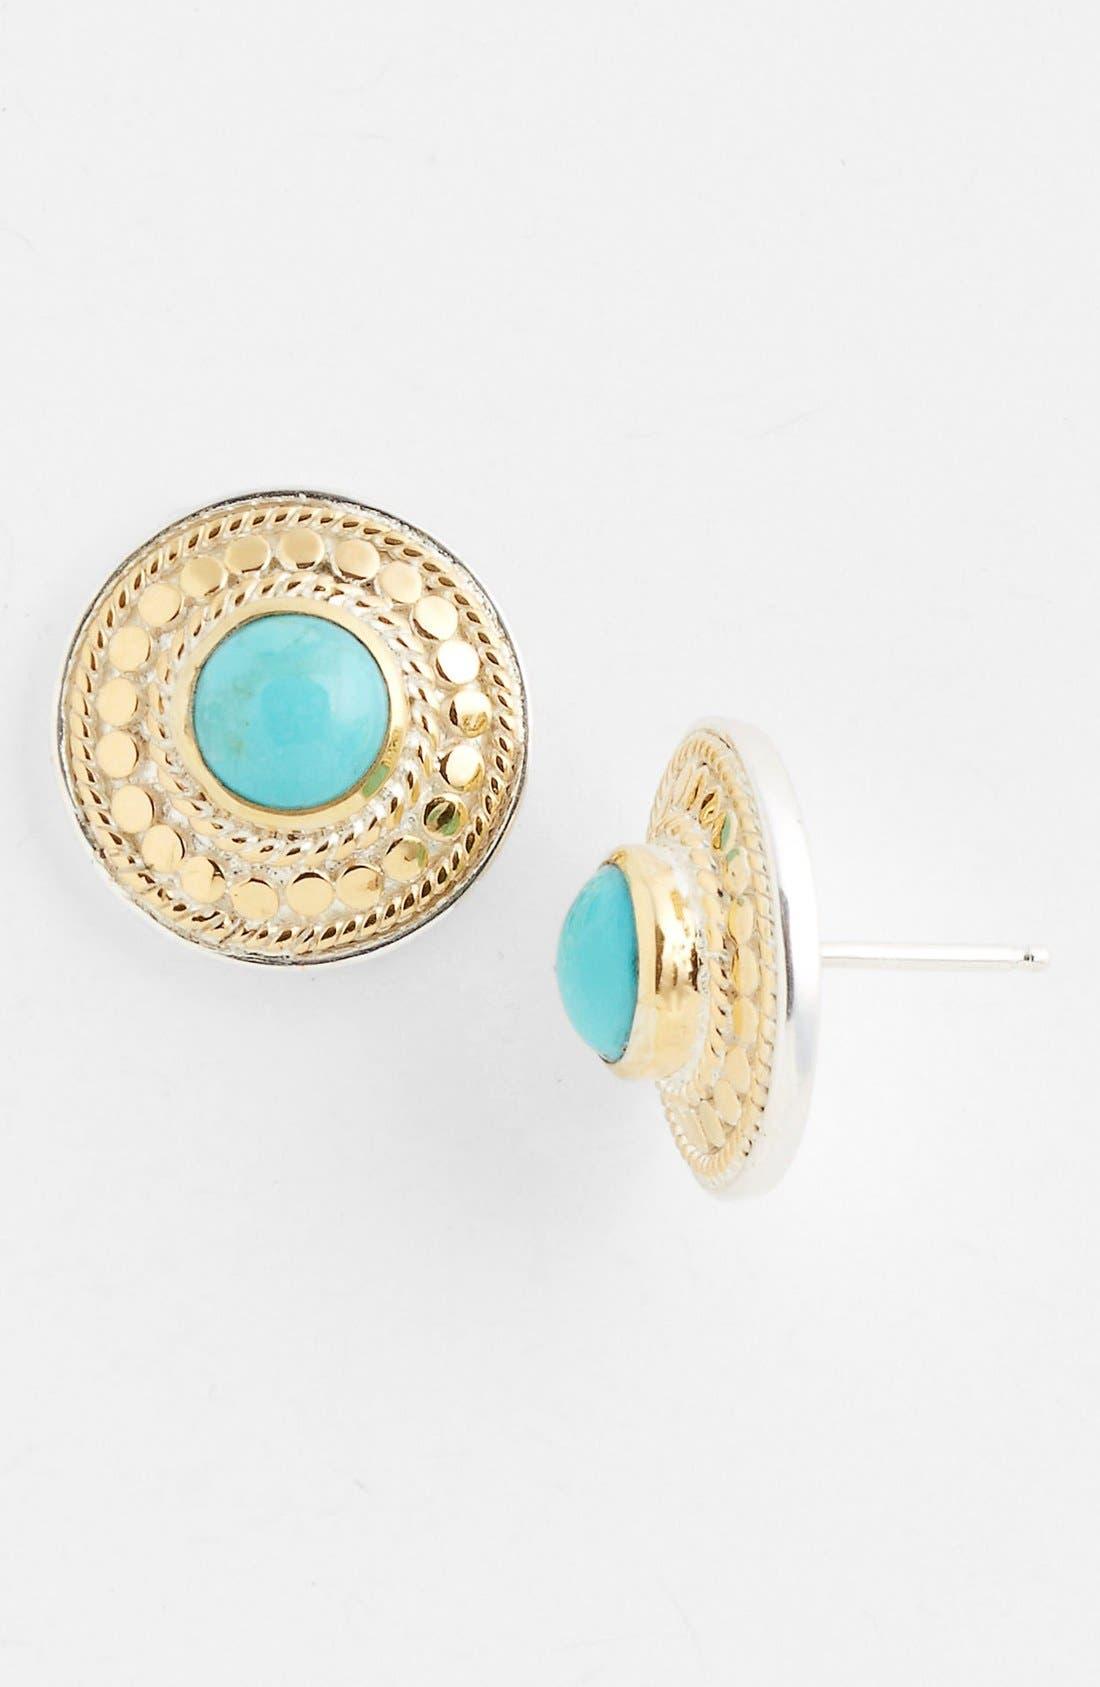 Main Image - Anna Beck 'Gili' Disk Stud Earrings